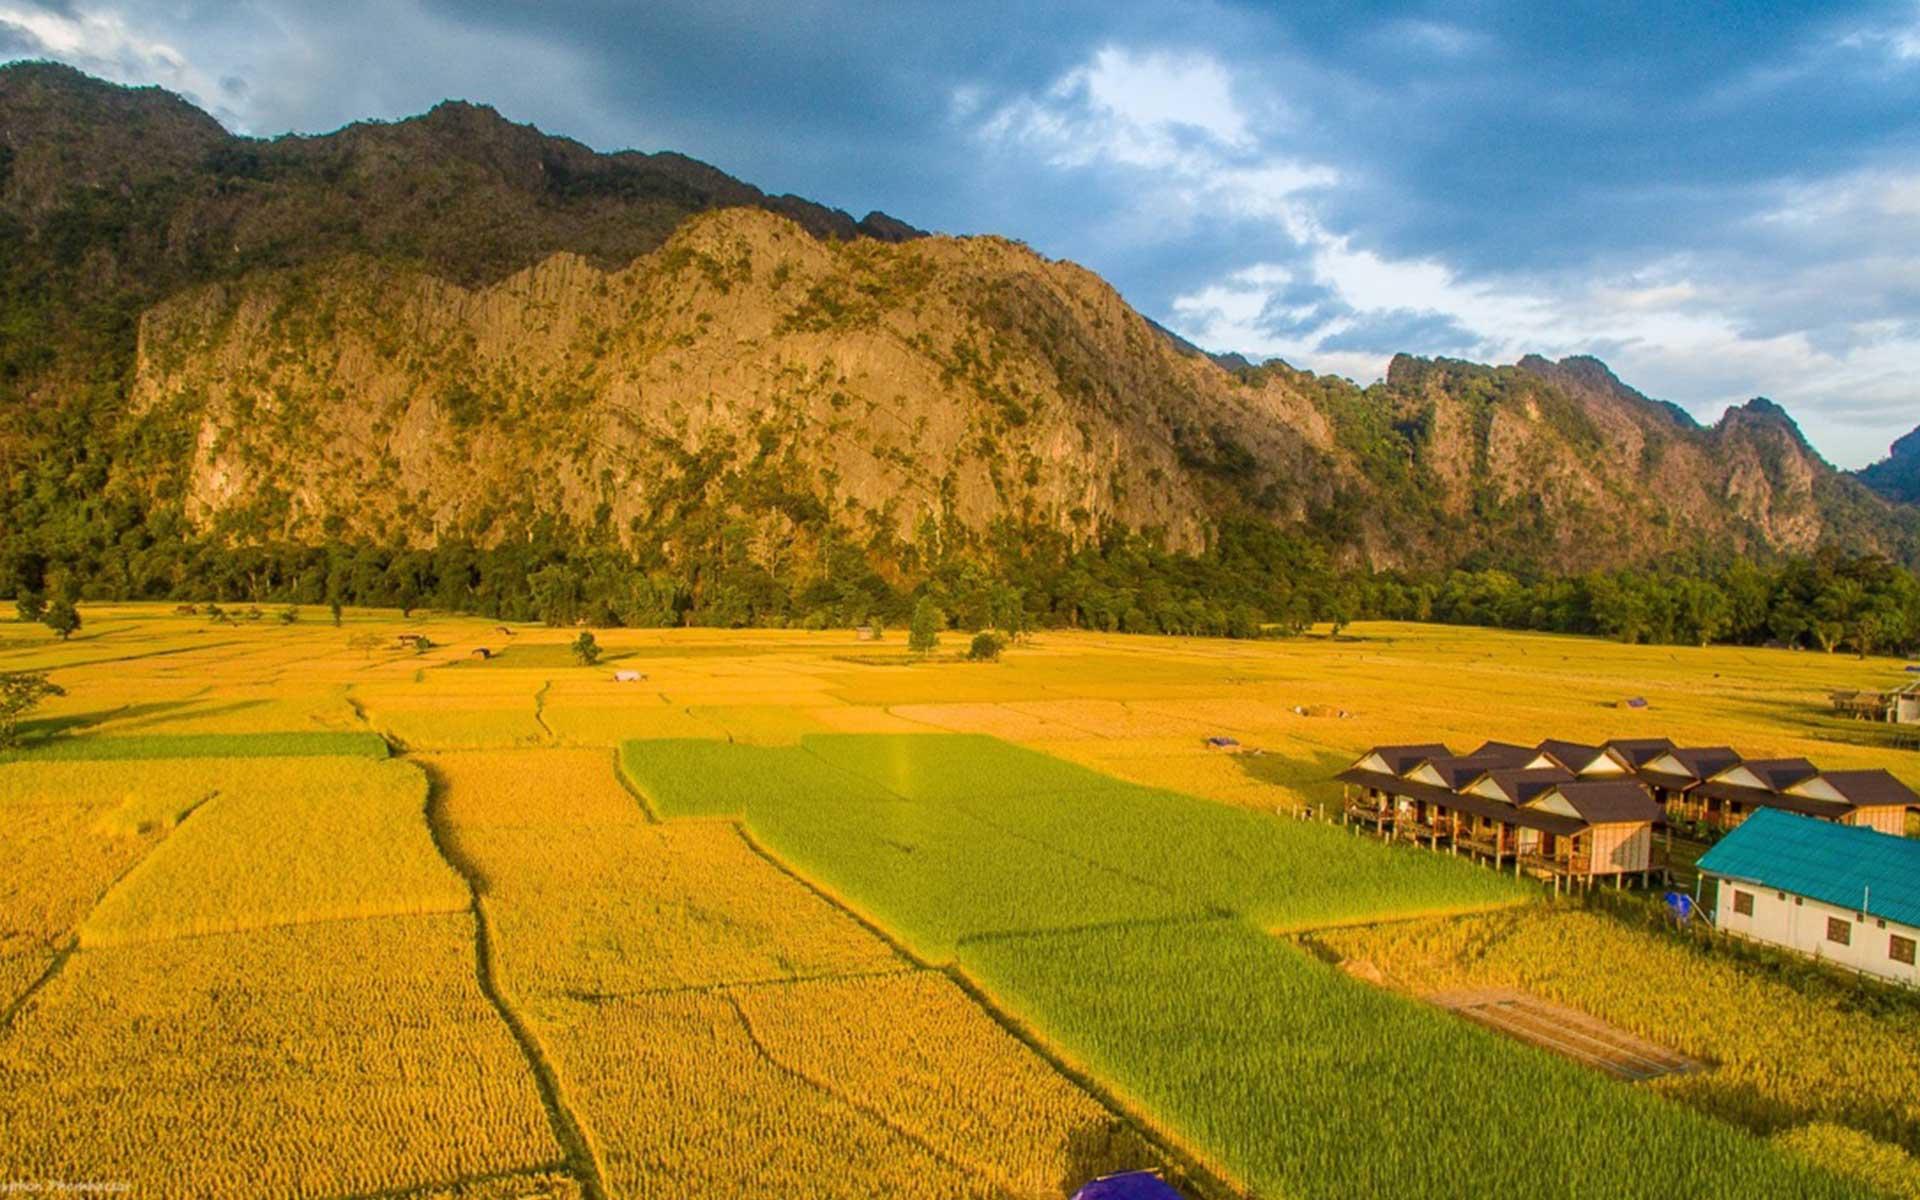 LAOS Laotravel 17 Laos Travel